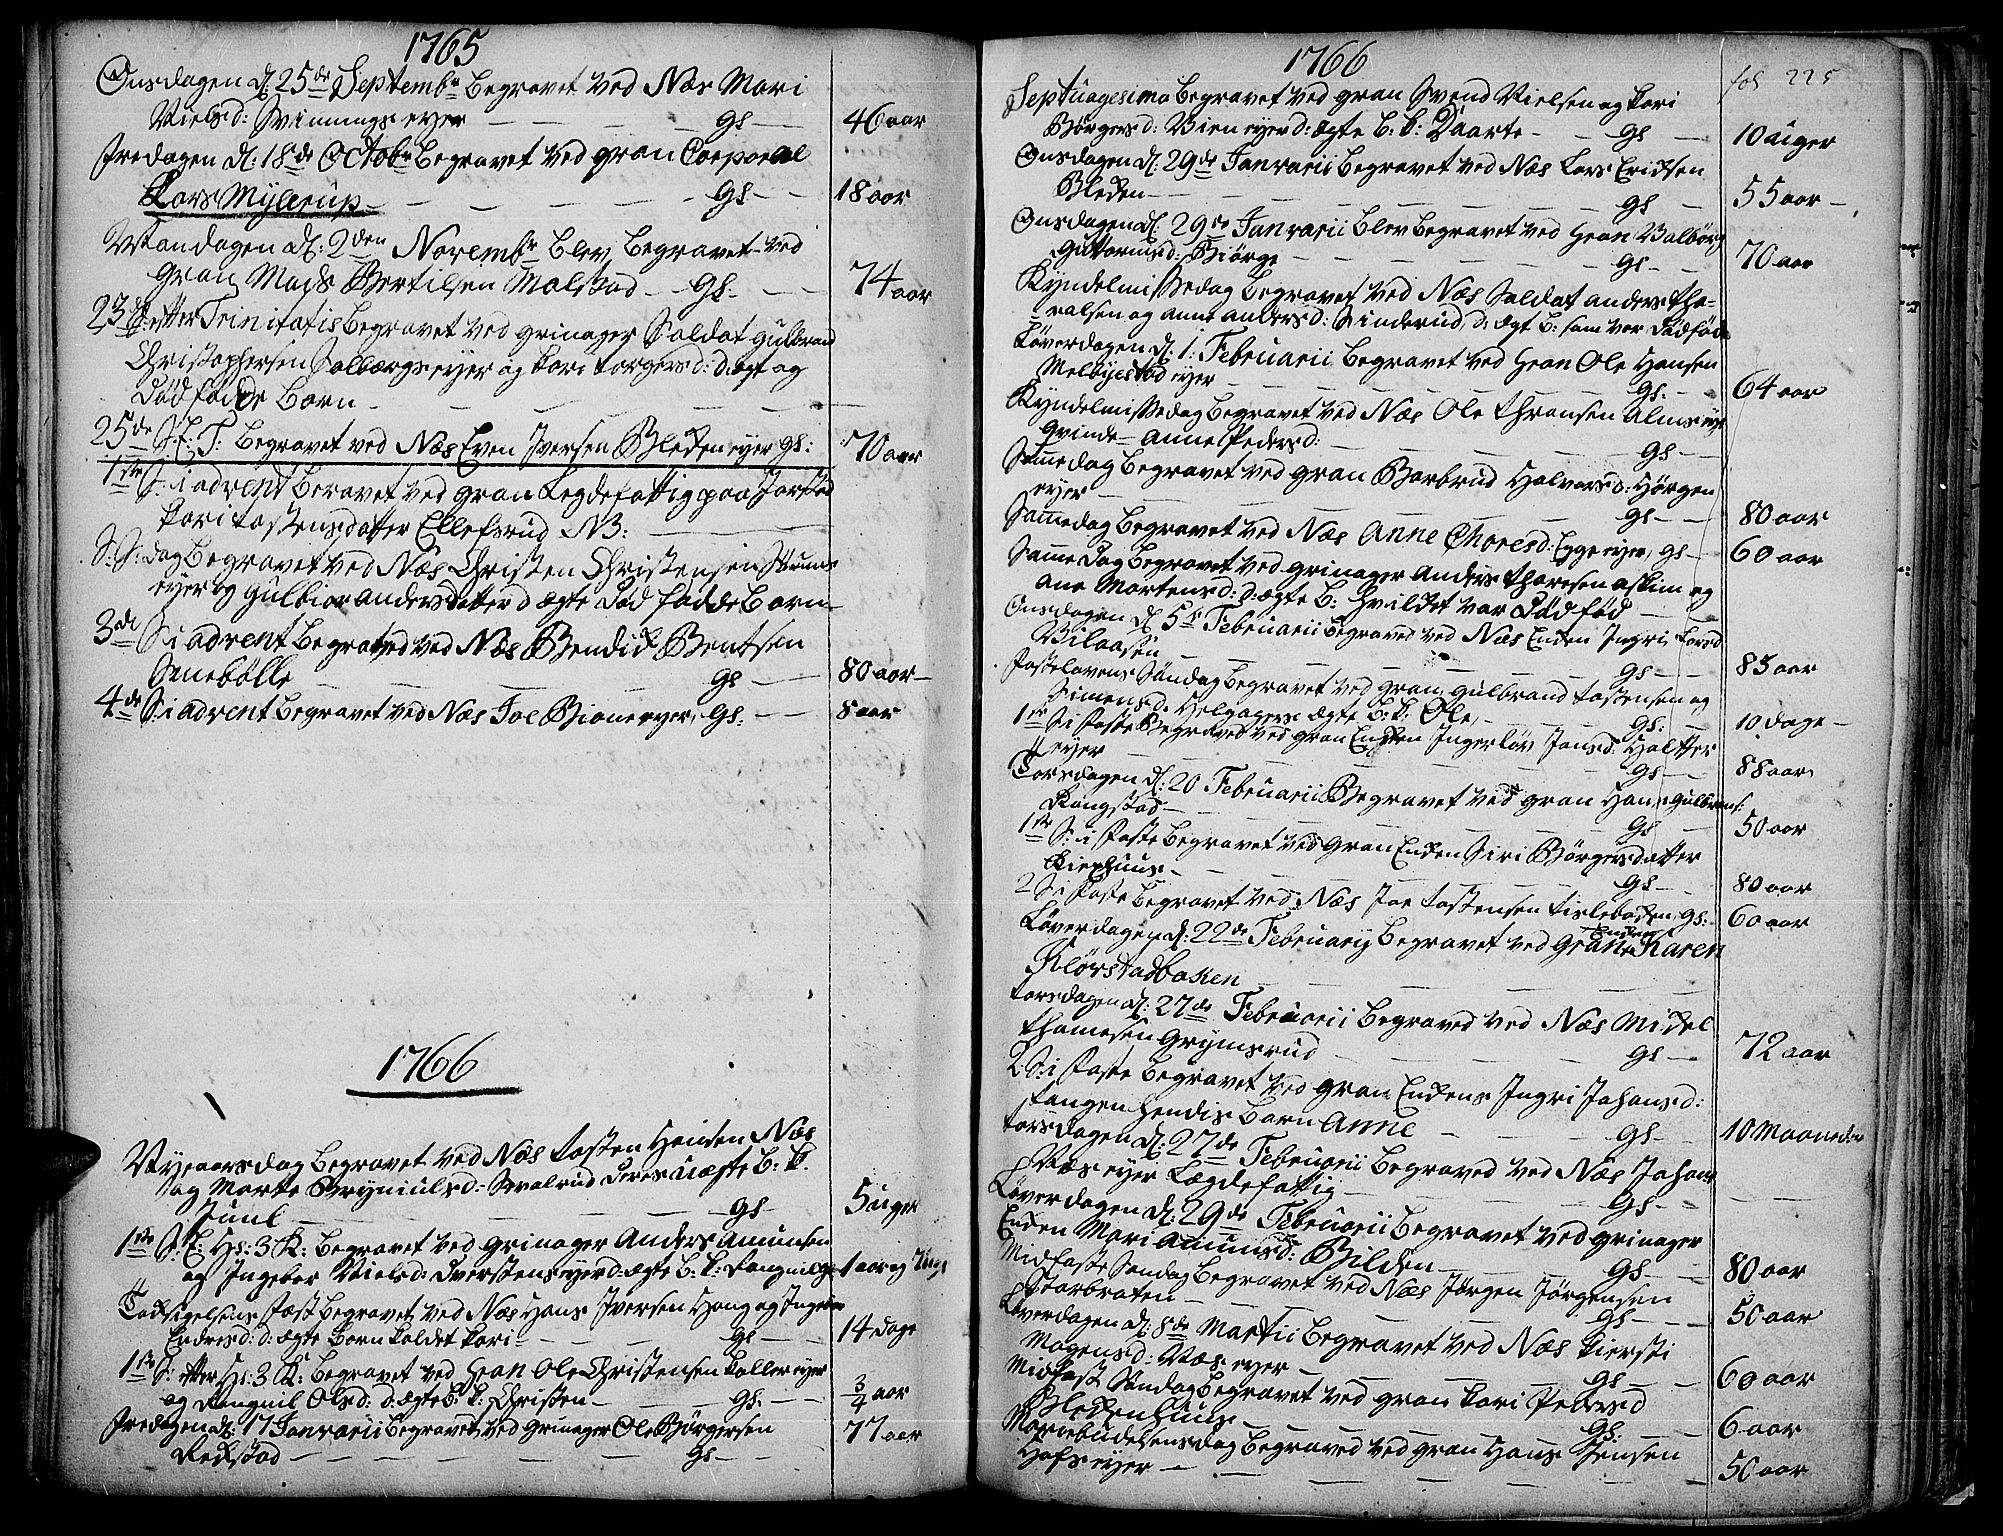 SAH, Gran prestekontor, Ministerialbok nr. 4, 1759-1775, s. 225